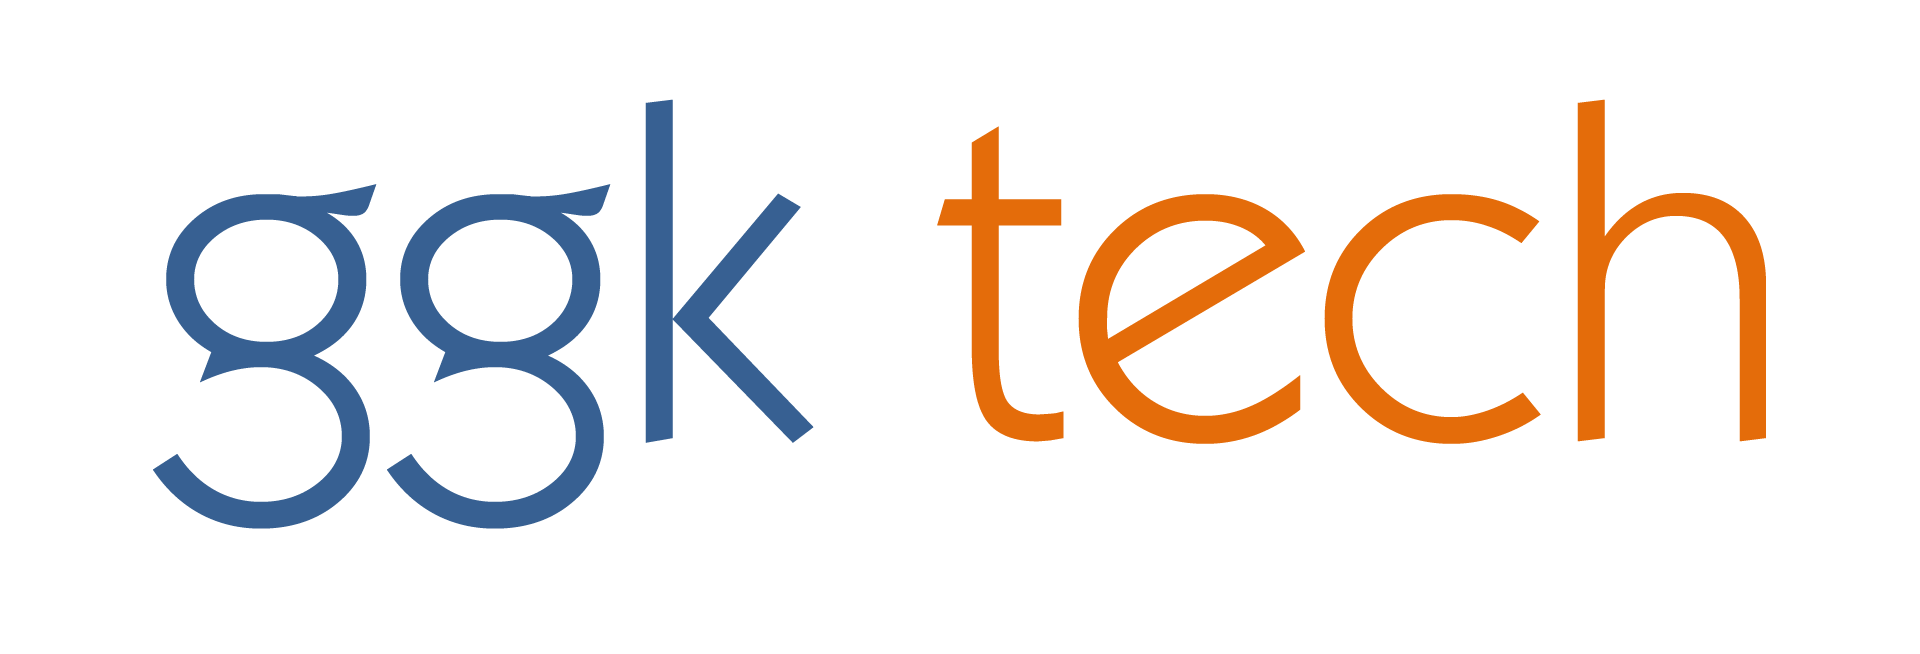 ggk technoligies logo faceprep